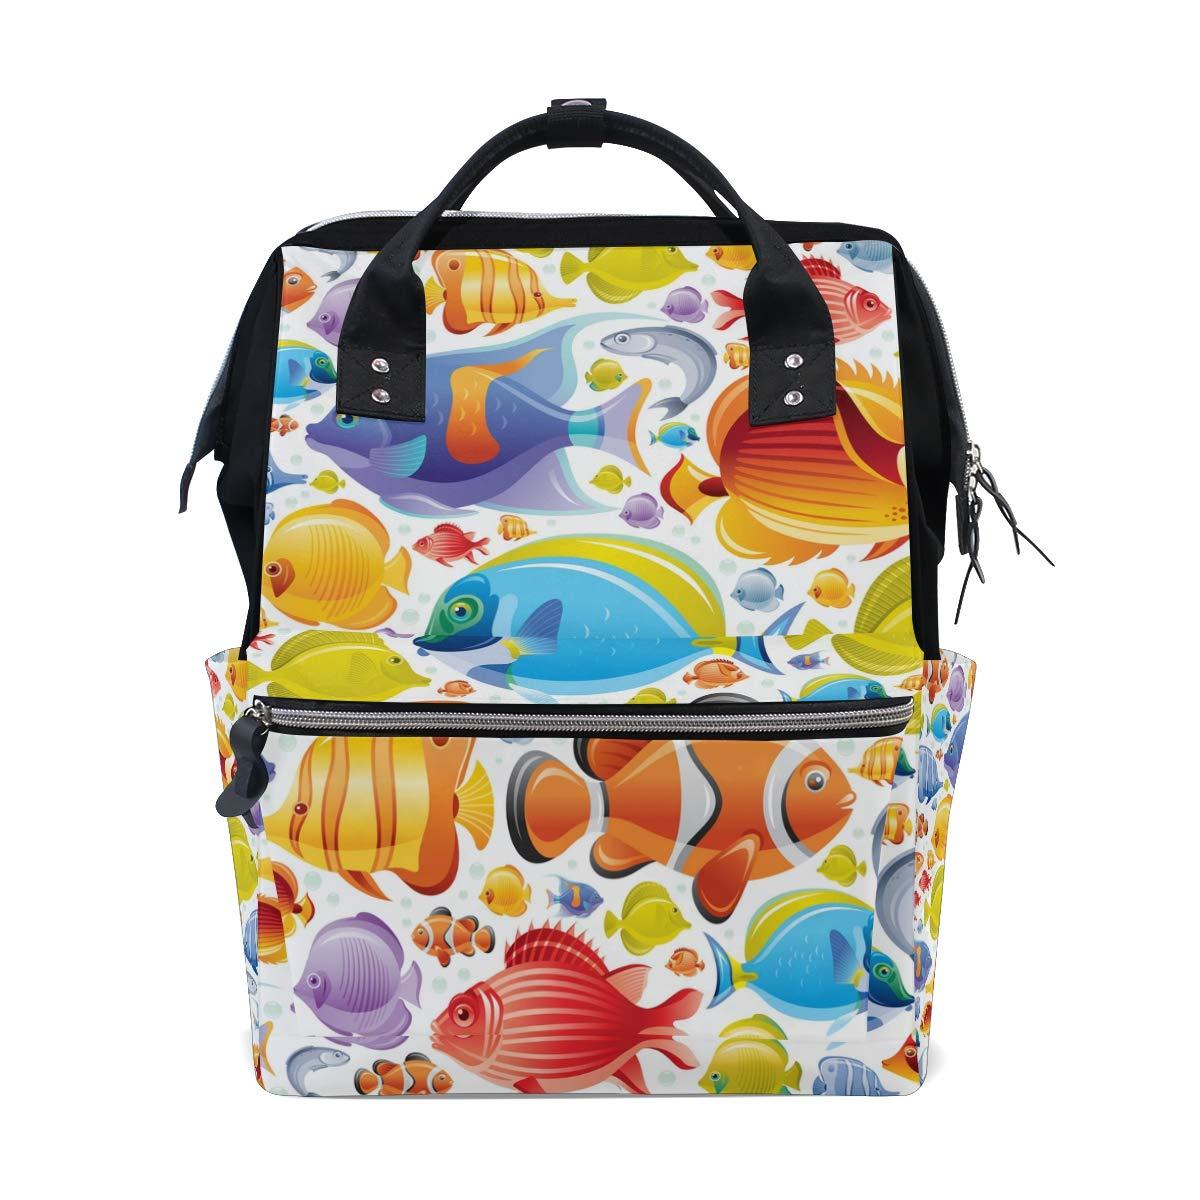 MALPLENA Daypack Amazing Sea Fishes School Bag Travel Backpack